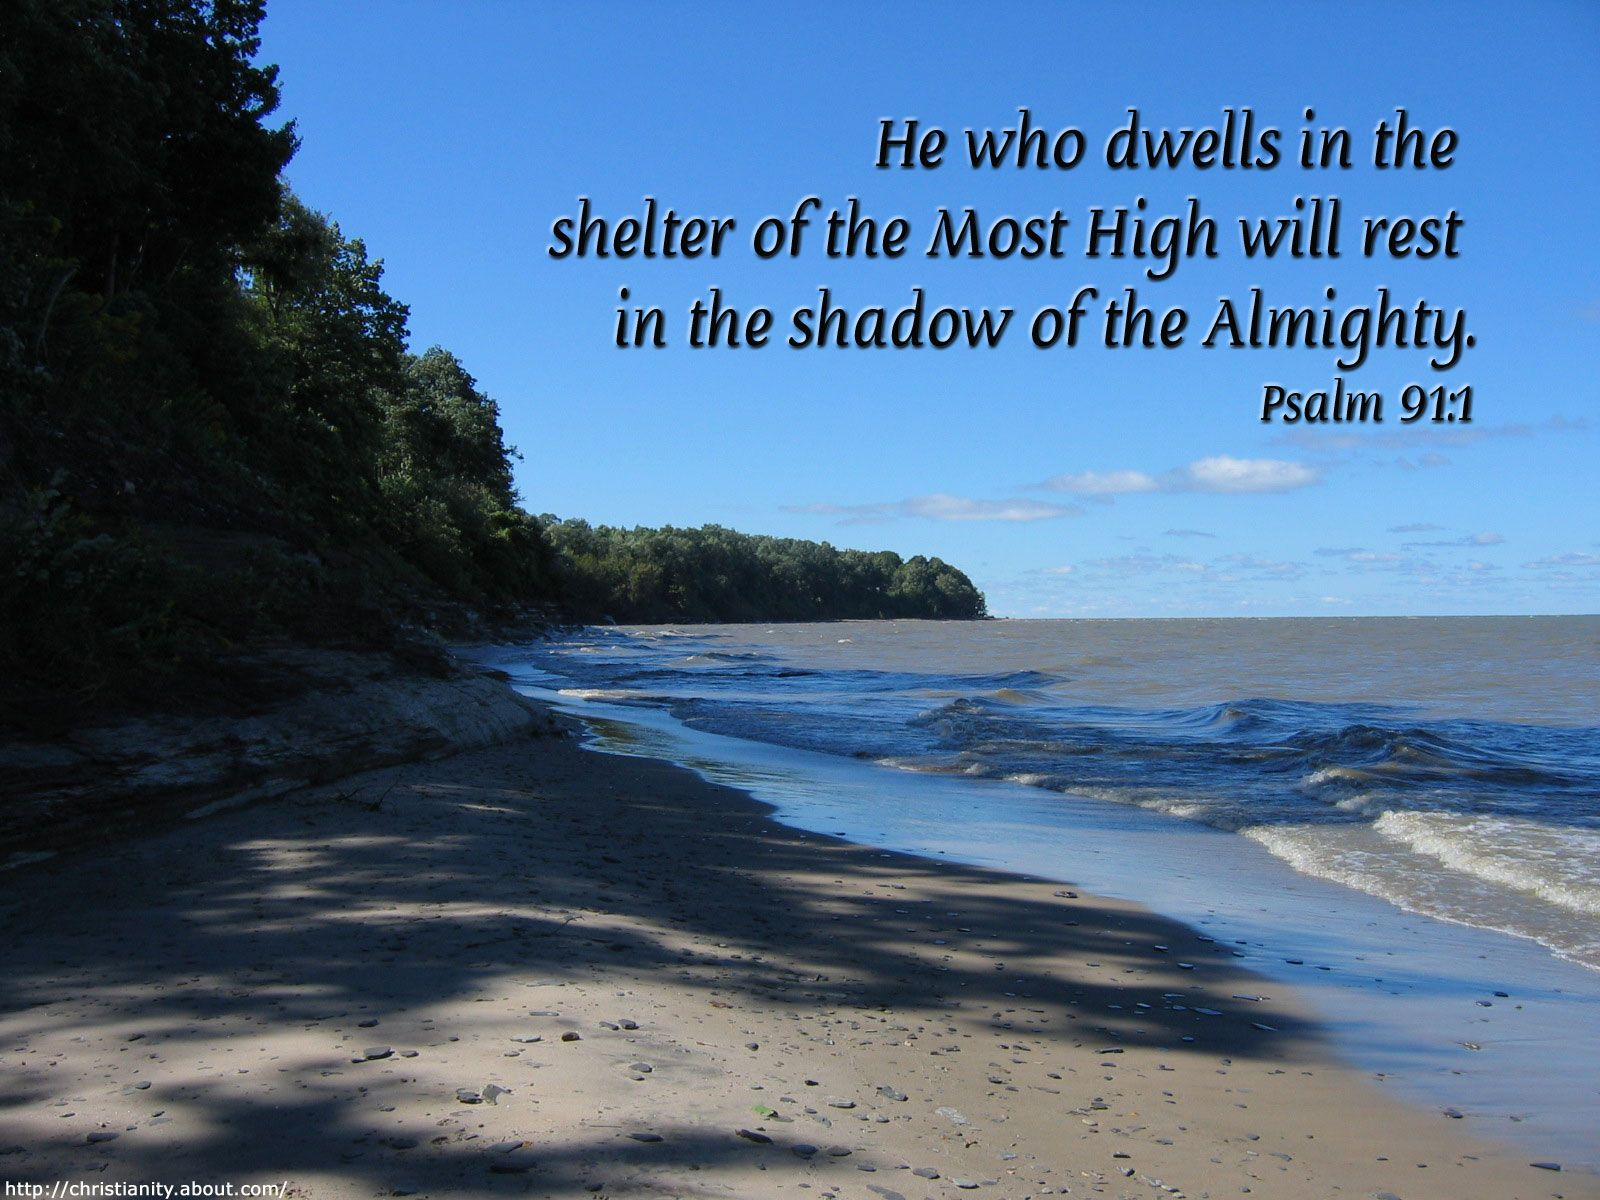 christian wallpaper psalms - photo #22